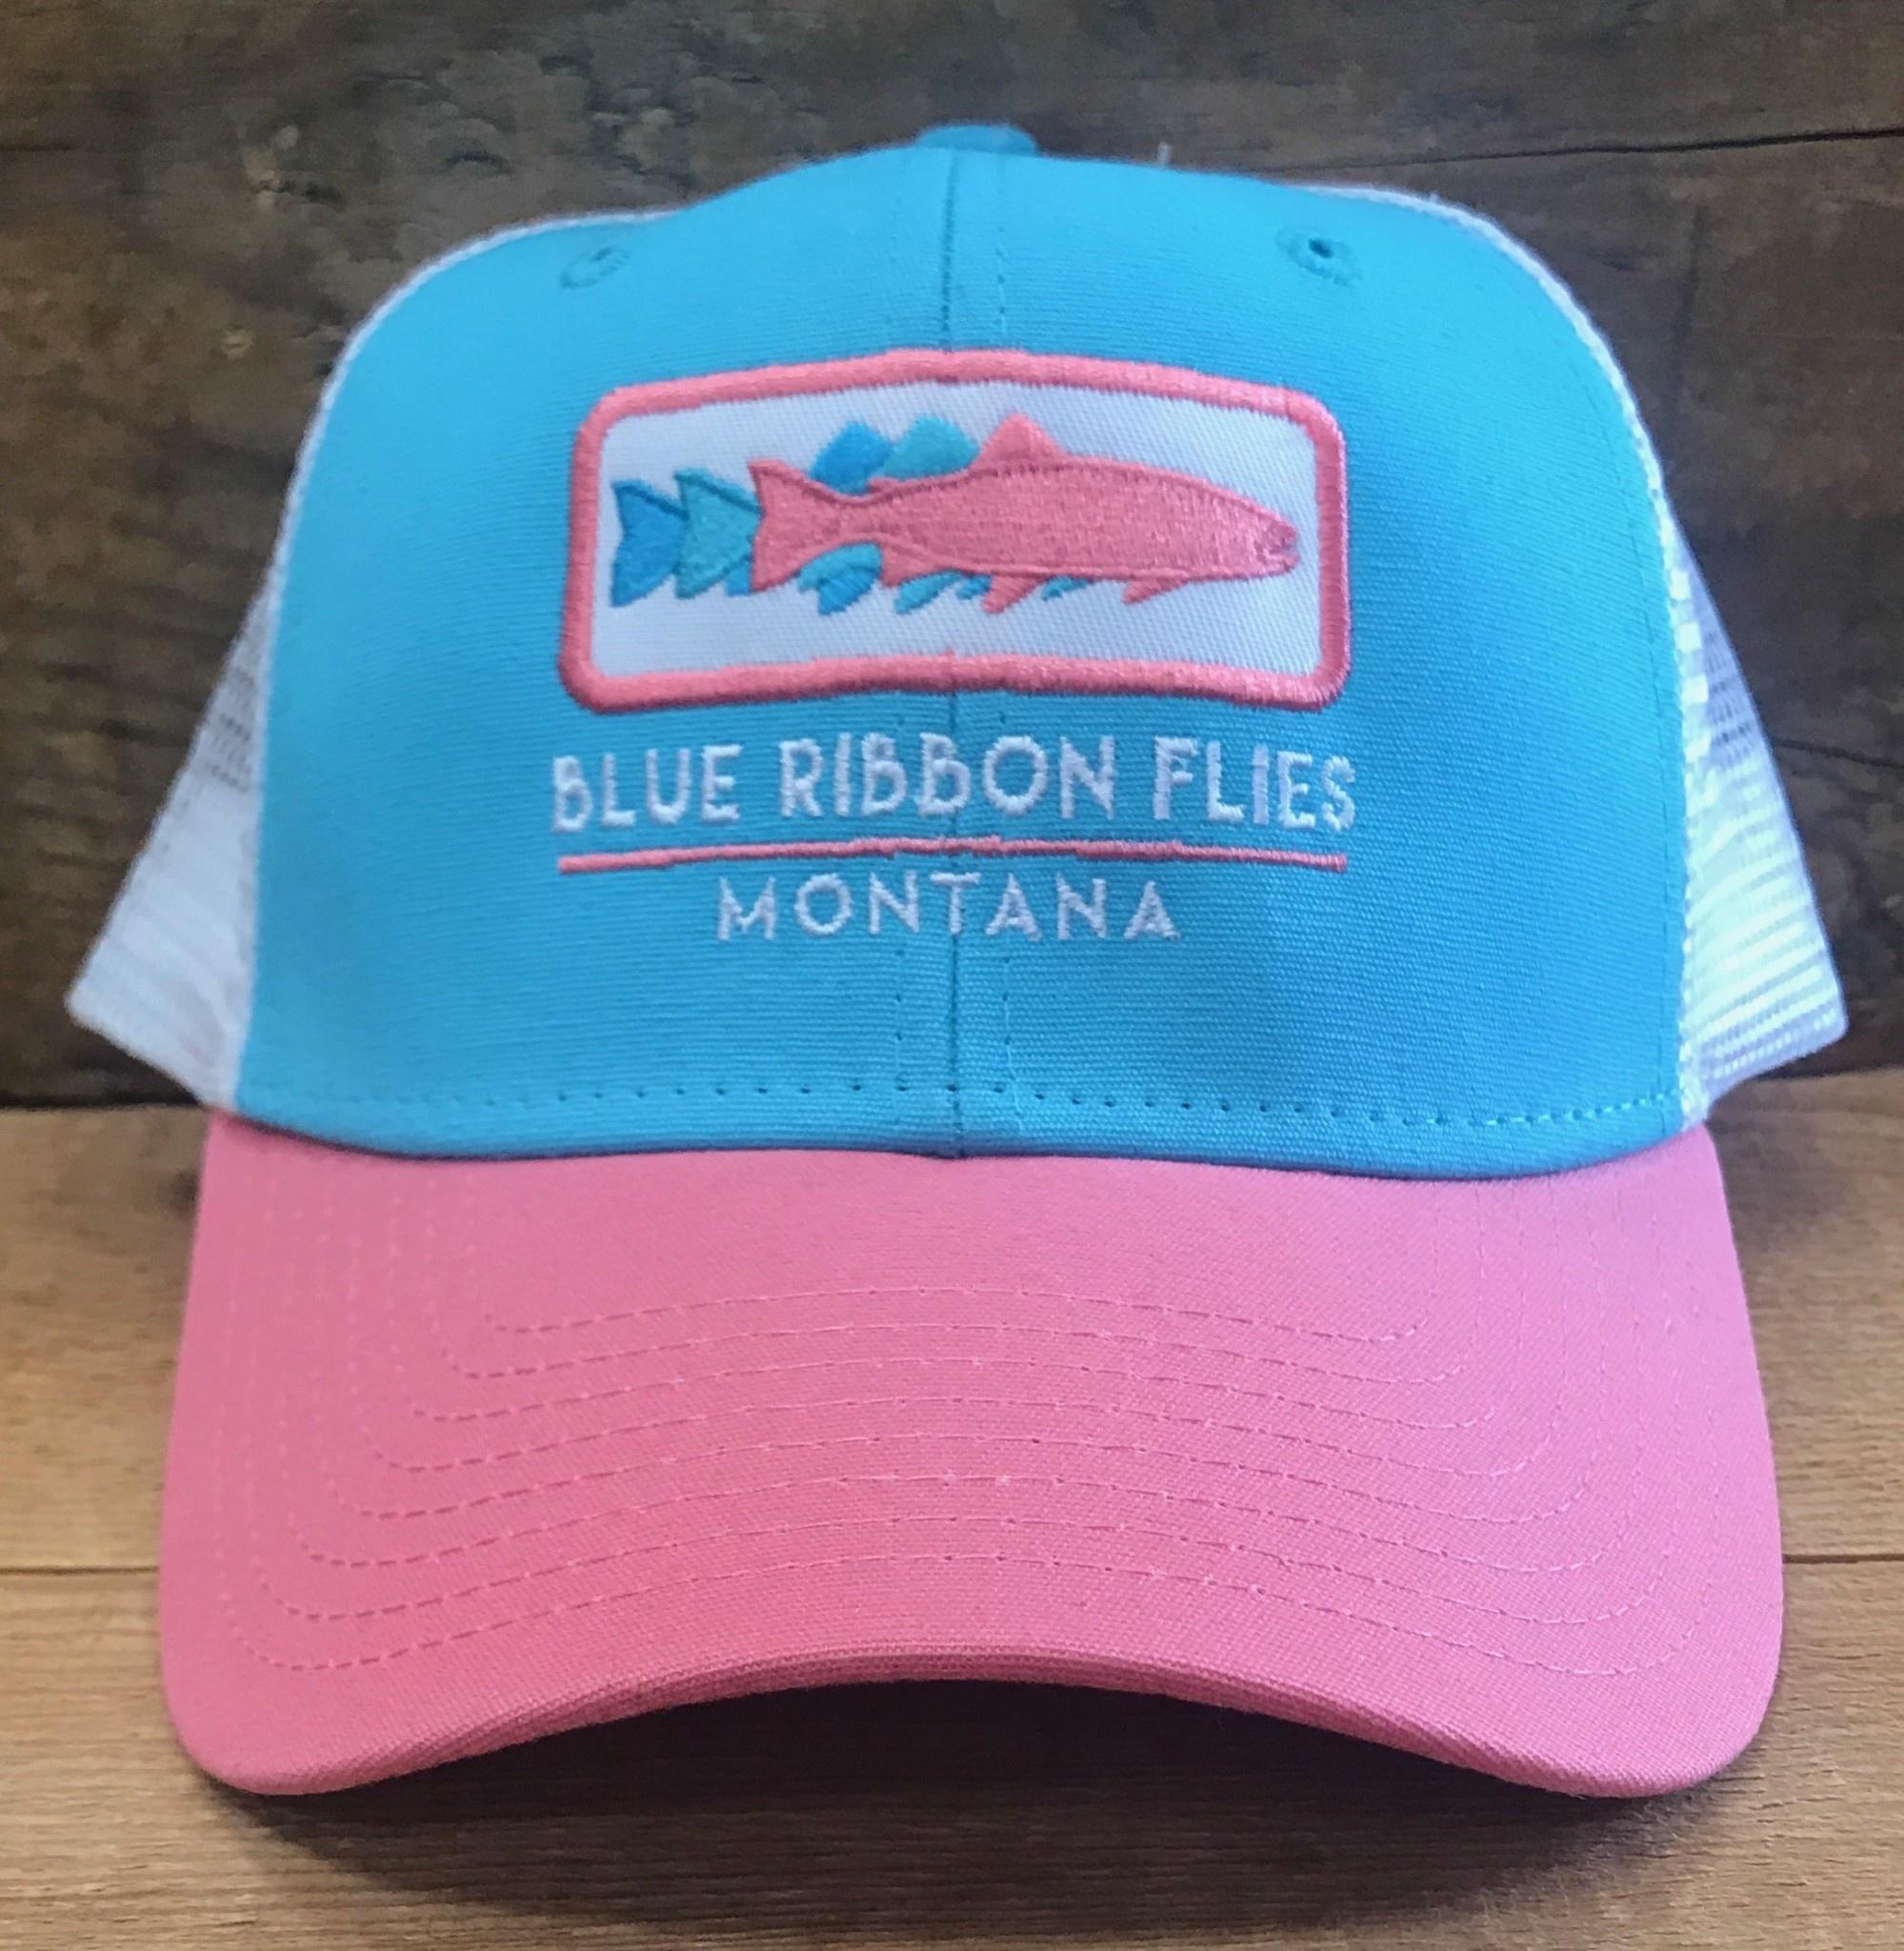 Hats BRF Triple Trout Industrial Mesh Cap